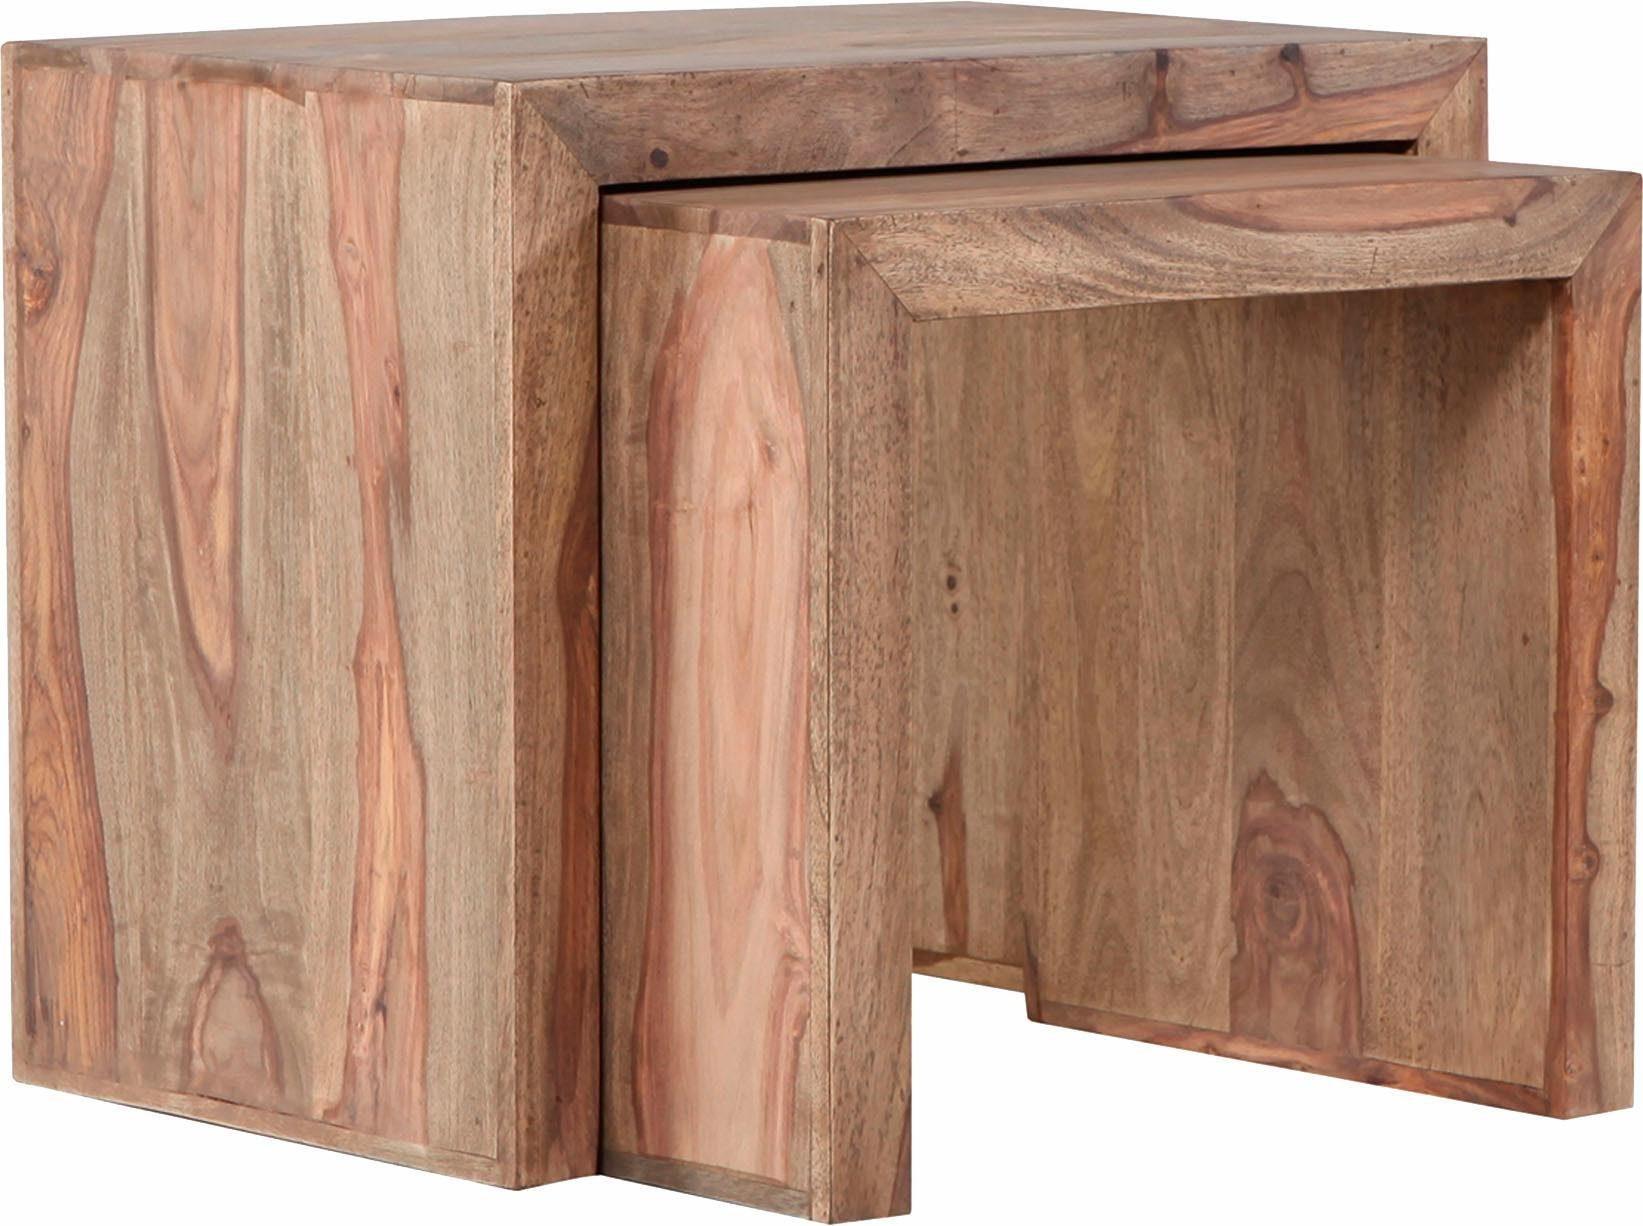 Gutmann Factory Satztisch »Inka« aus massivem Sheesham Holz